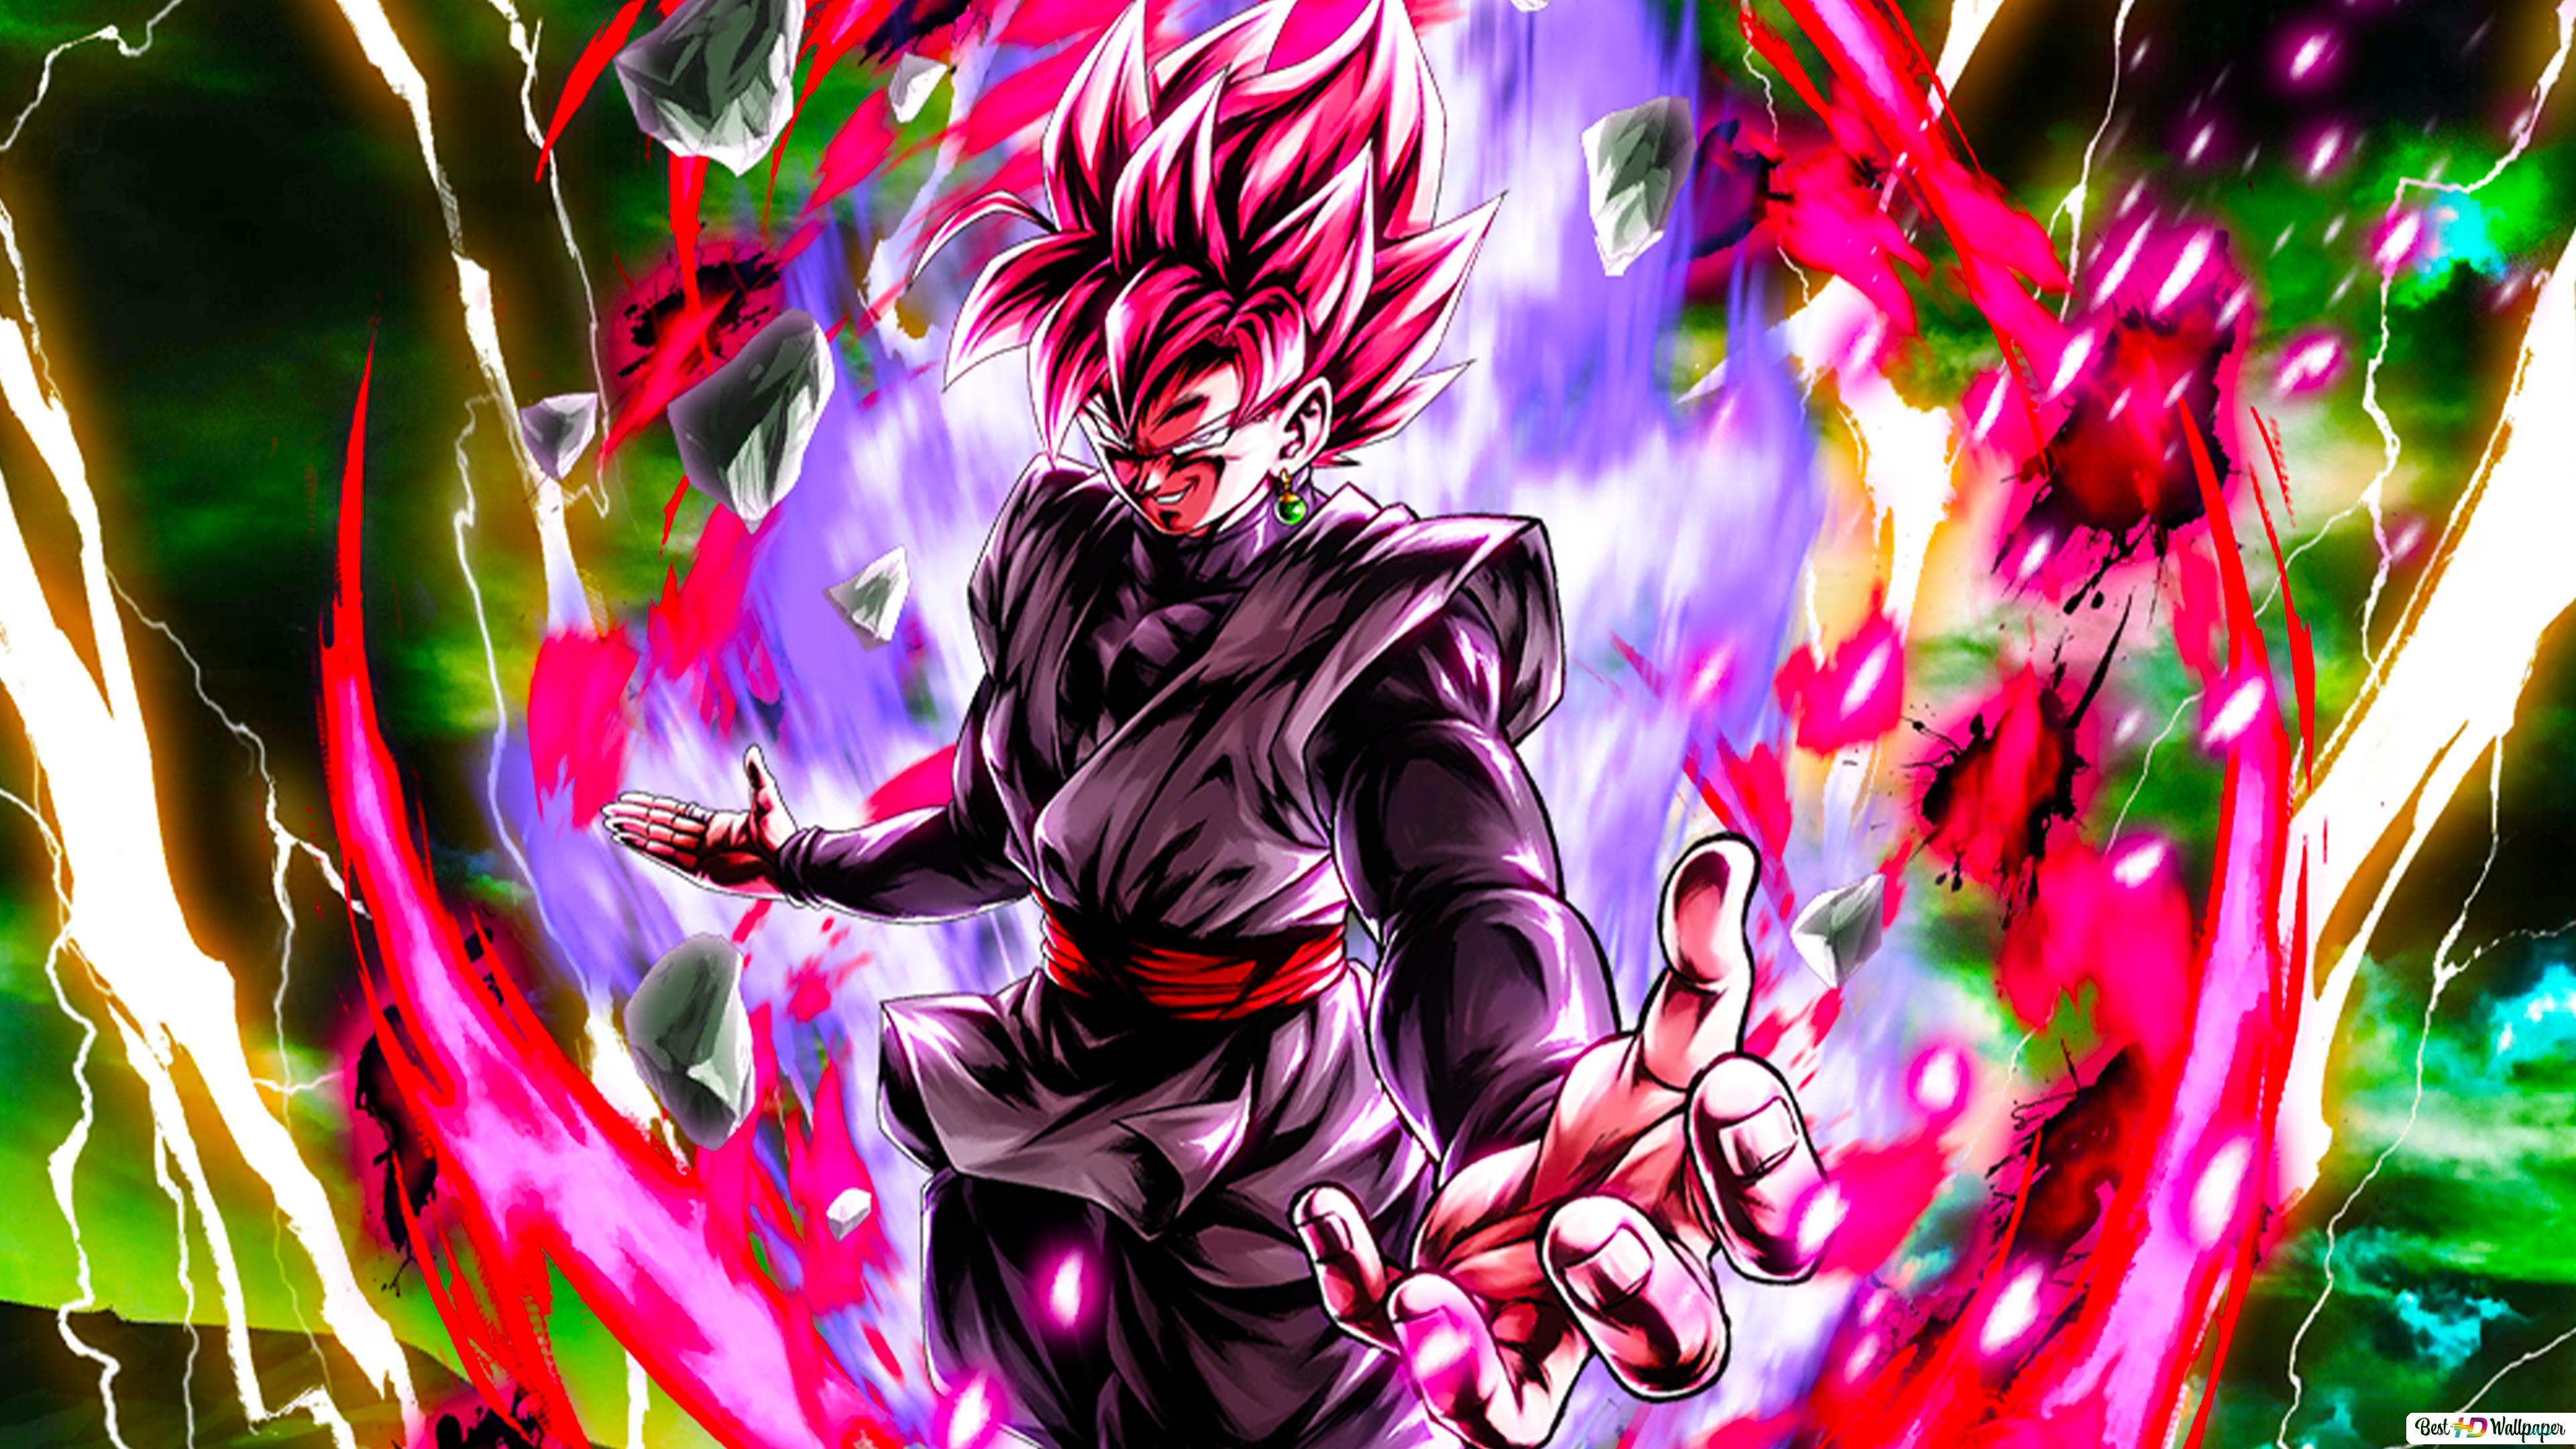 Super Saiyan Rose Goku Black Dari Dragon Ball Super Dragon Ball Legends Arts Untuk Desktop Unduhan Wallpaper Hd